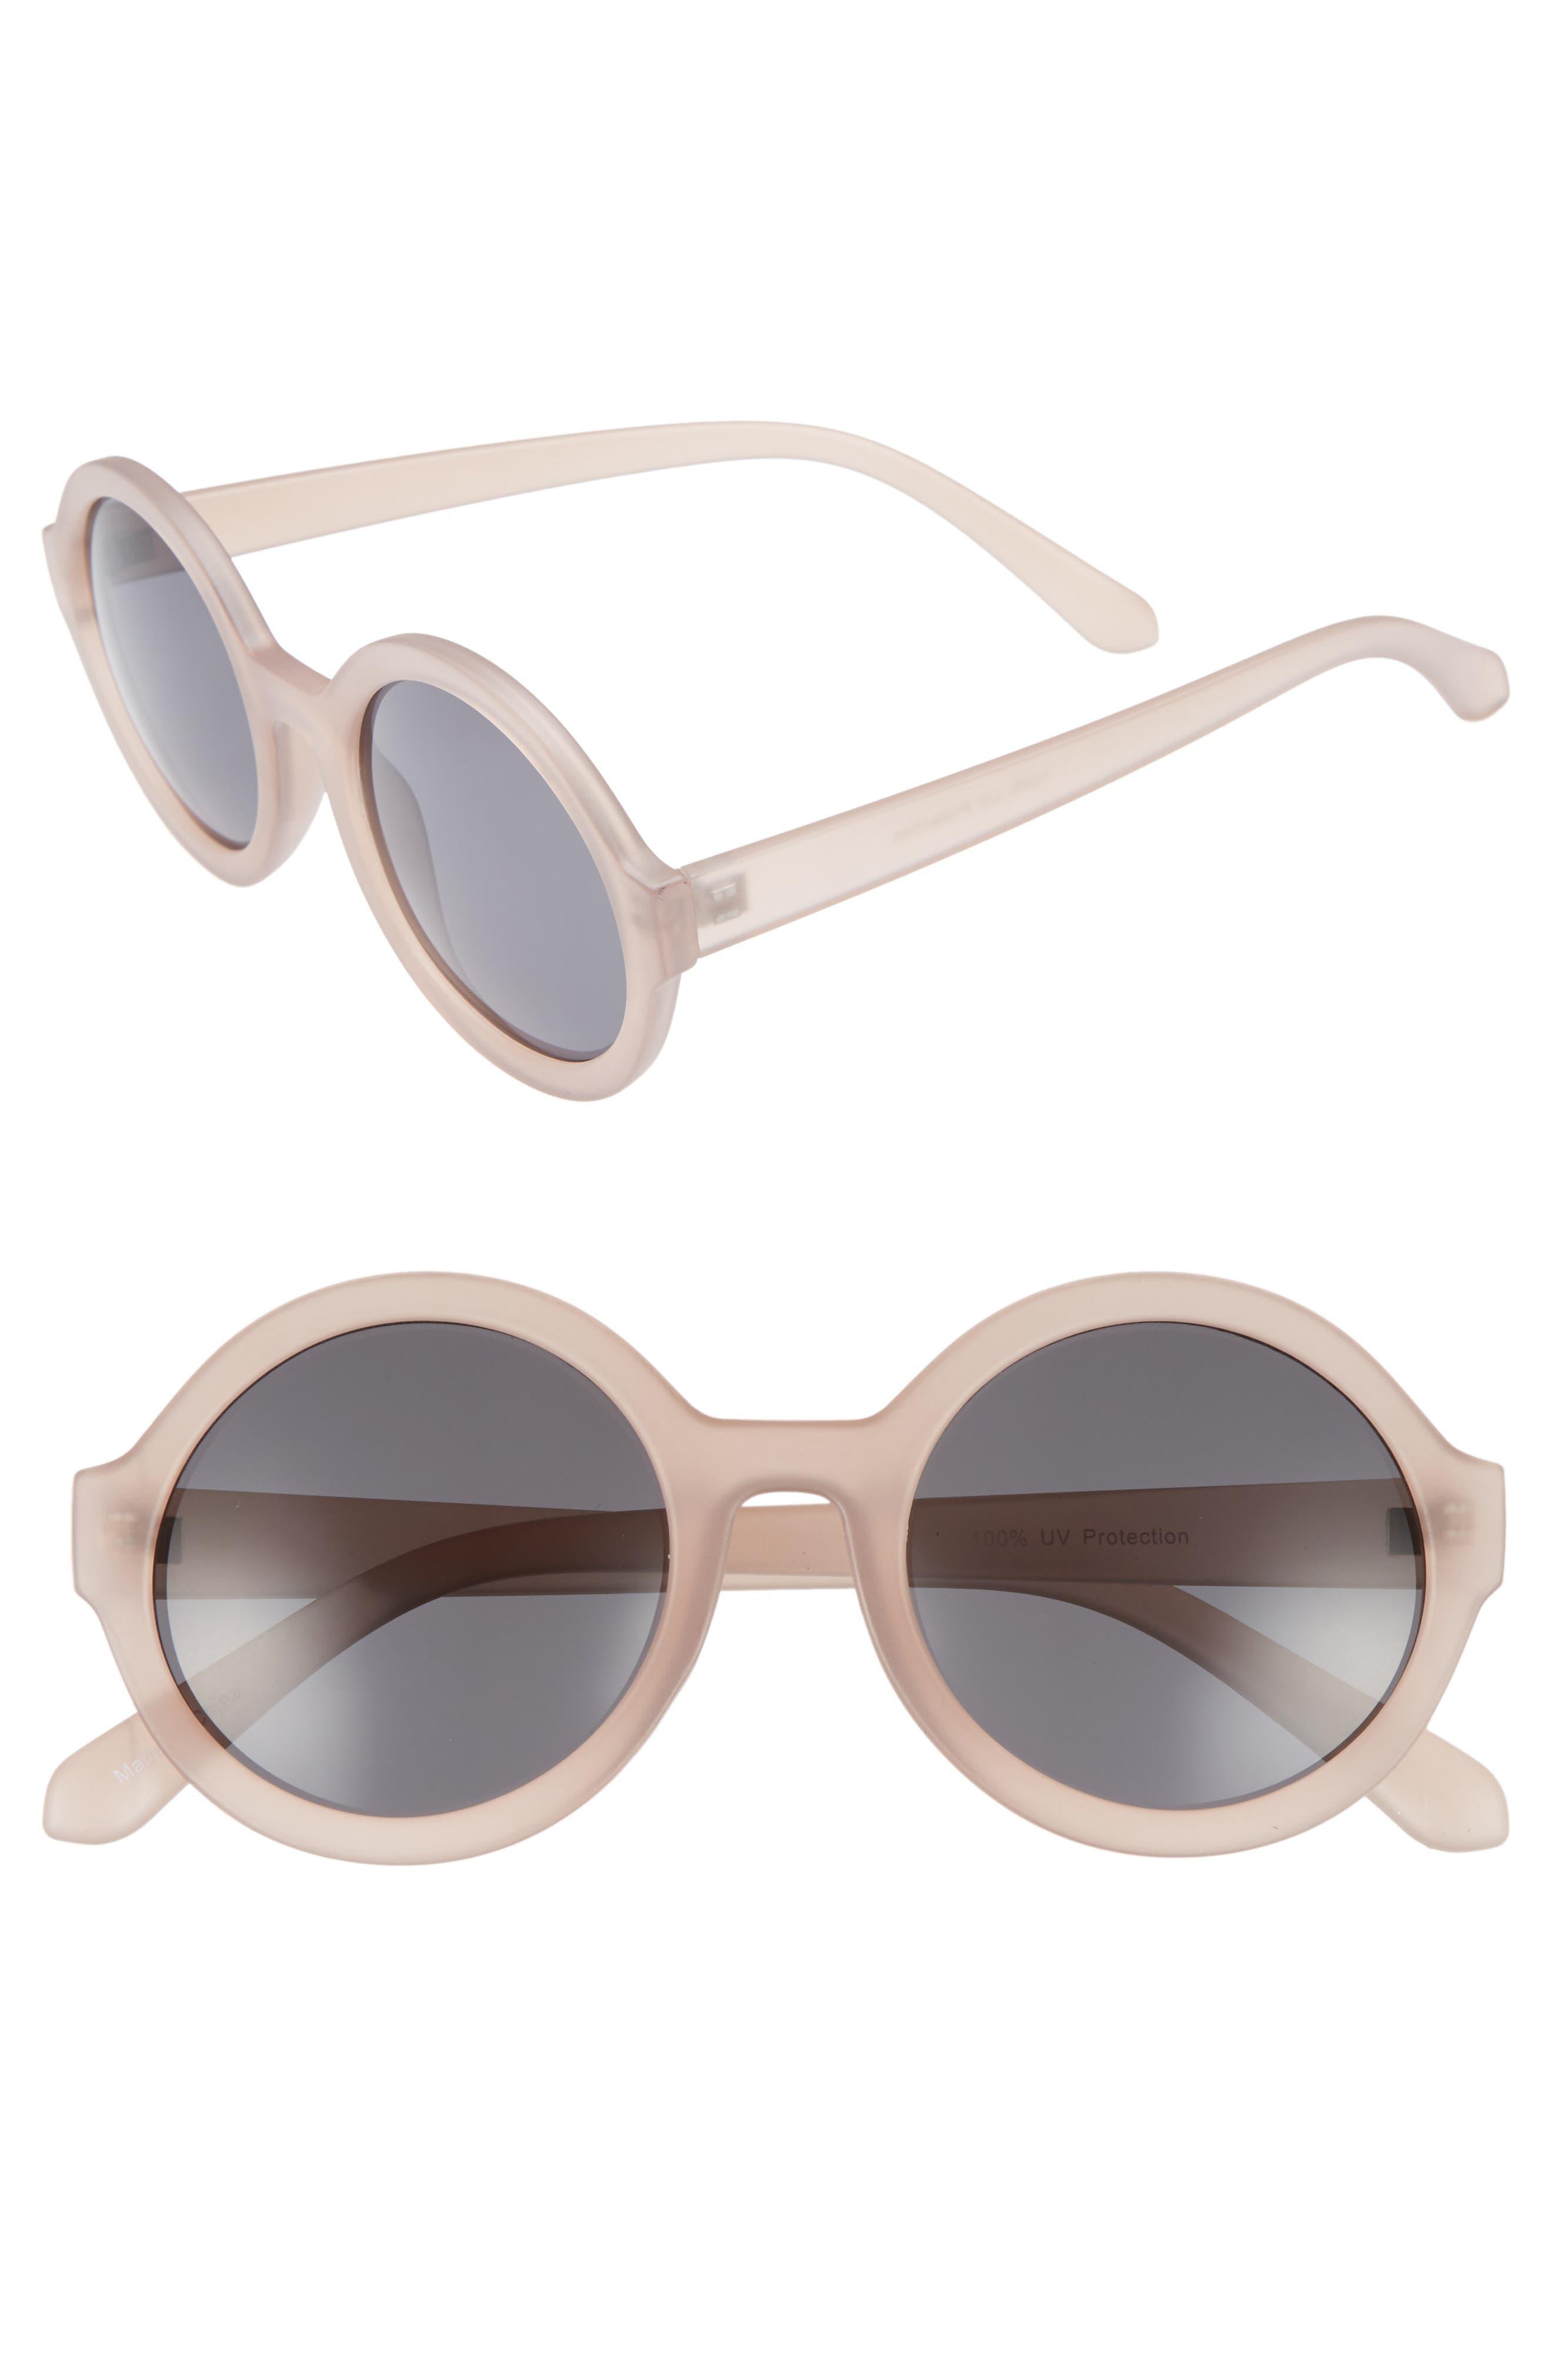 50mm Round Sunglasses,                         Main,                         color, 650